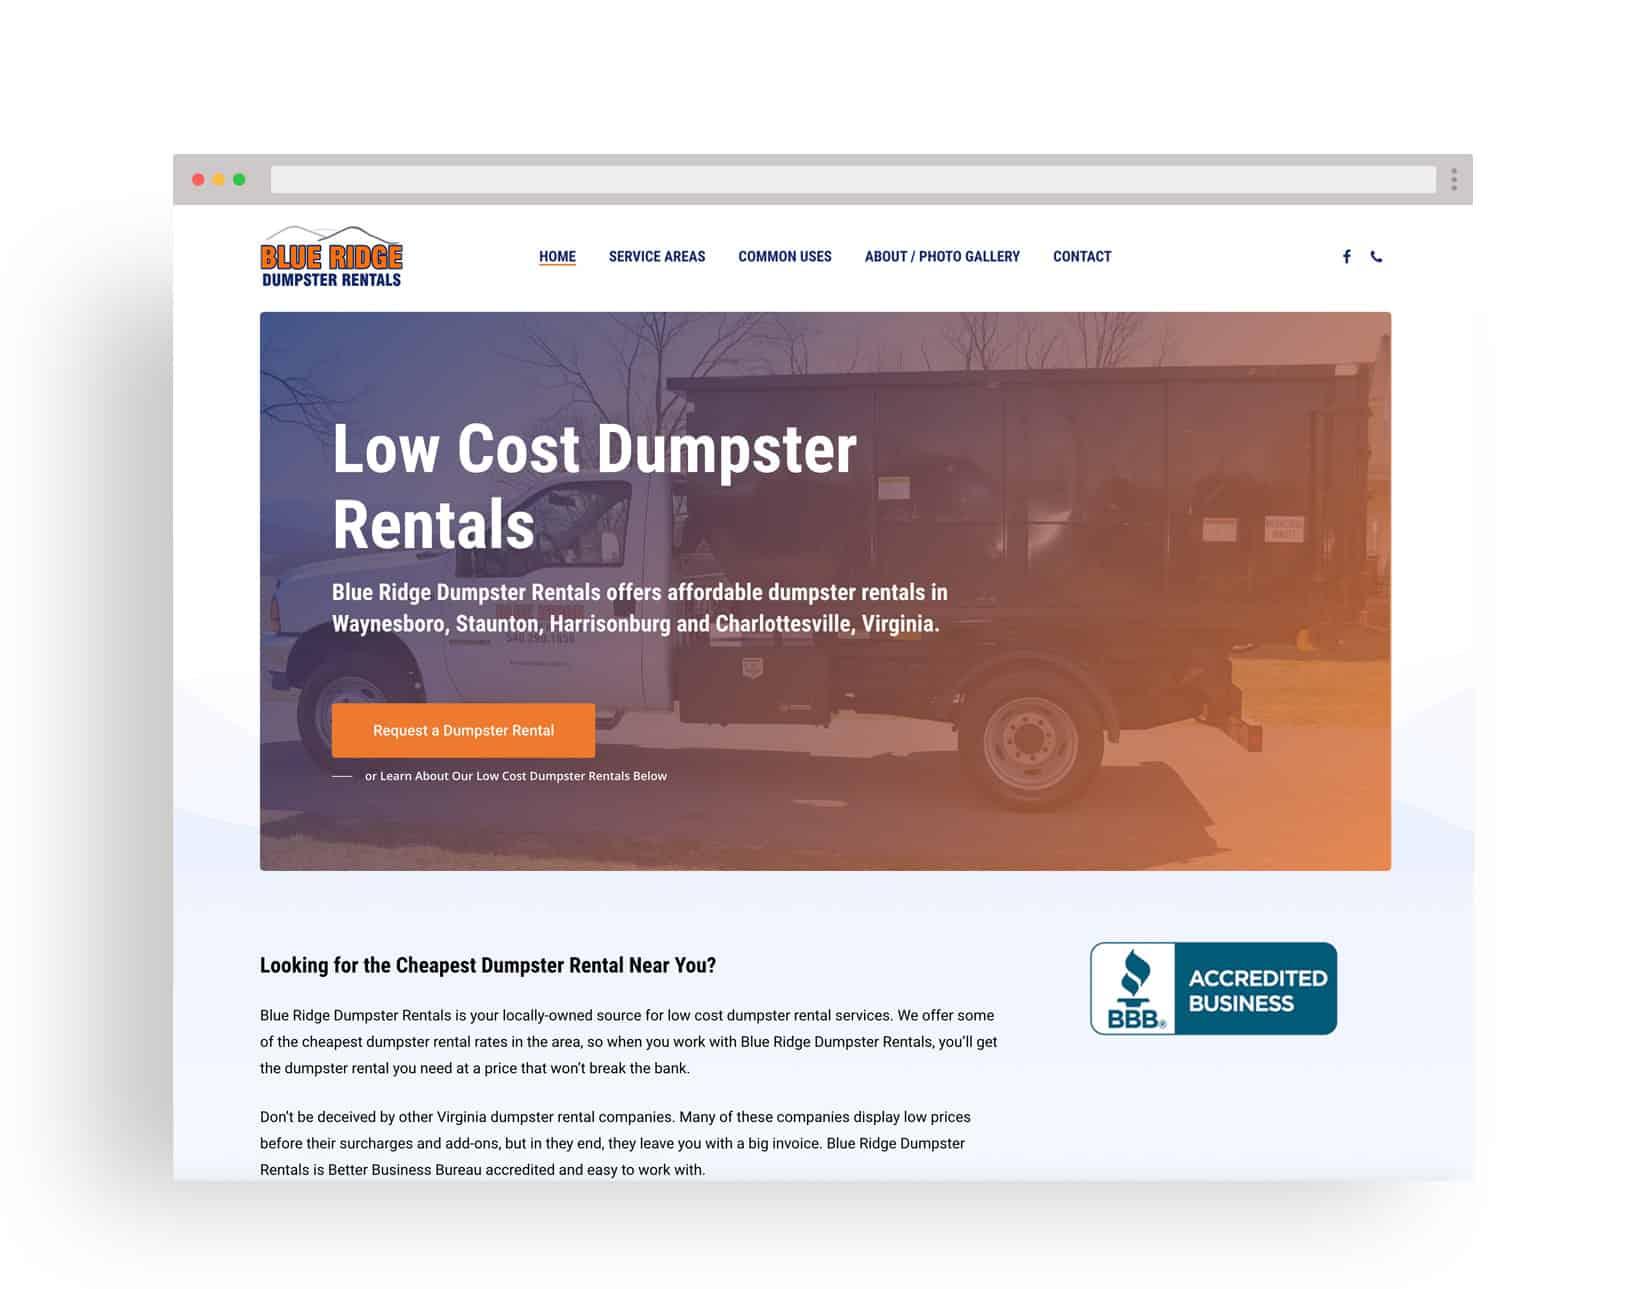 Studio JWAL Web Design Client - Blue Ridge Dumpster Rentals